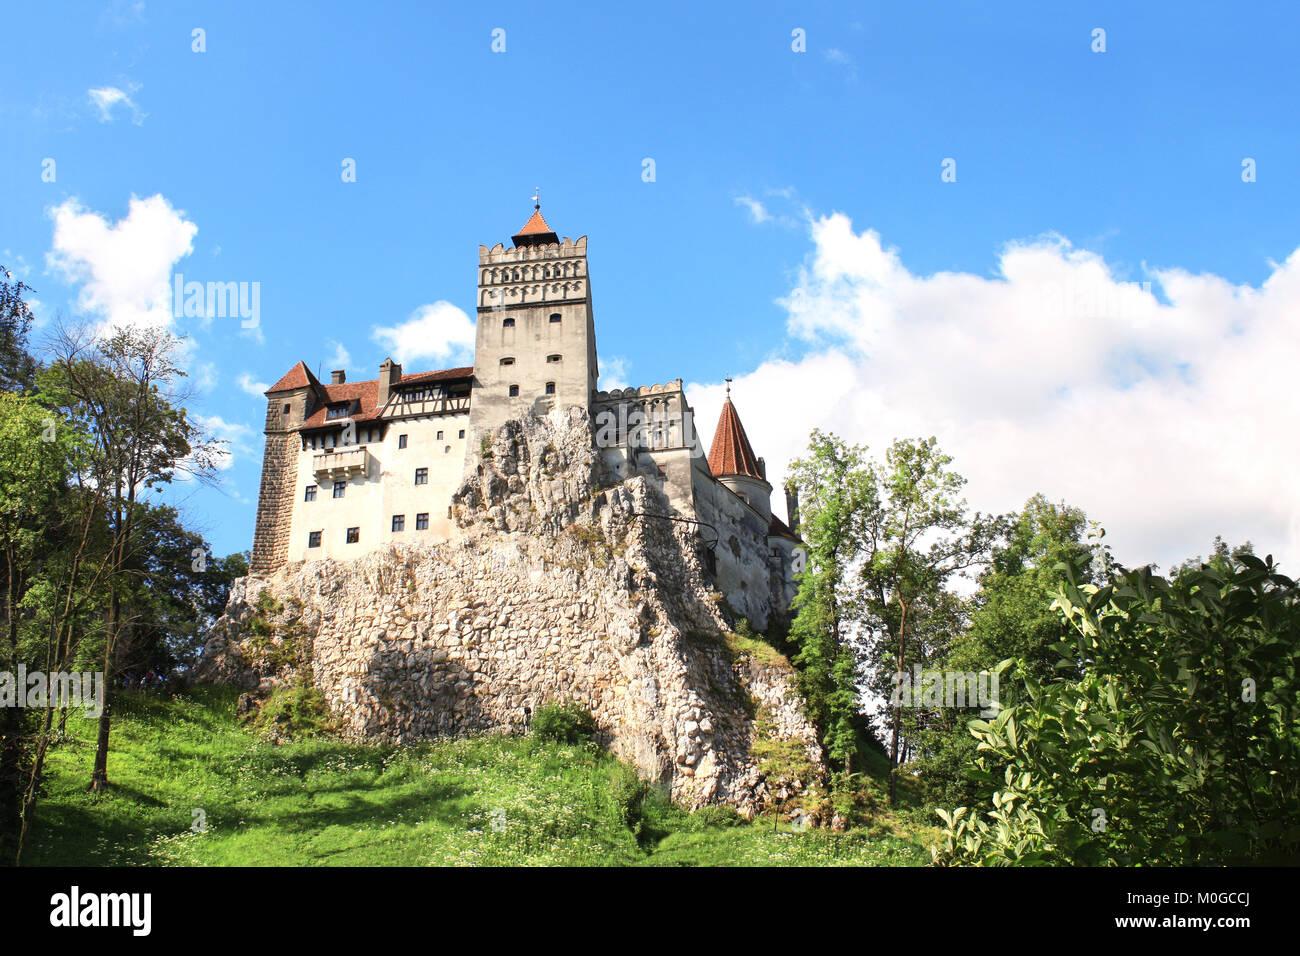 Medieval Castle of Bran (Dracula's castle), Brasov, Transylvania, Romania, Europe - Stock Image